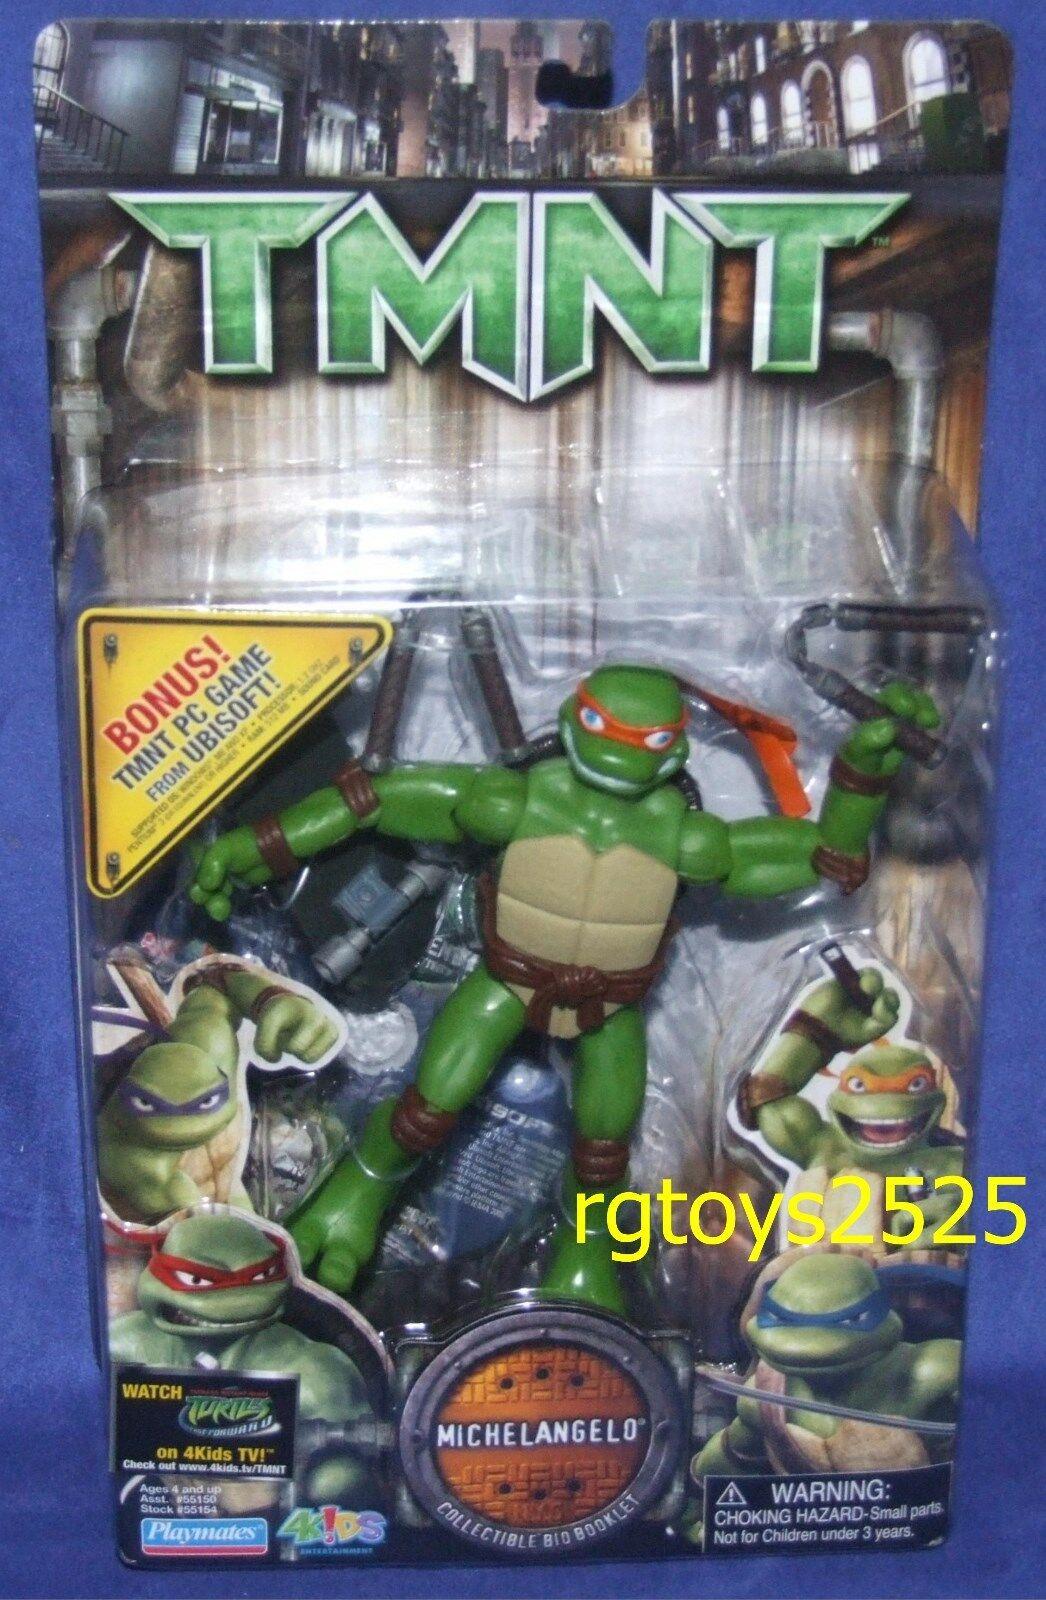 Teenage mutant ninja turtles film 6  michelangelo neue fabrik versiegelt, 2006